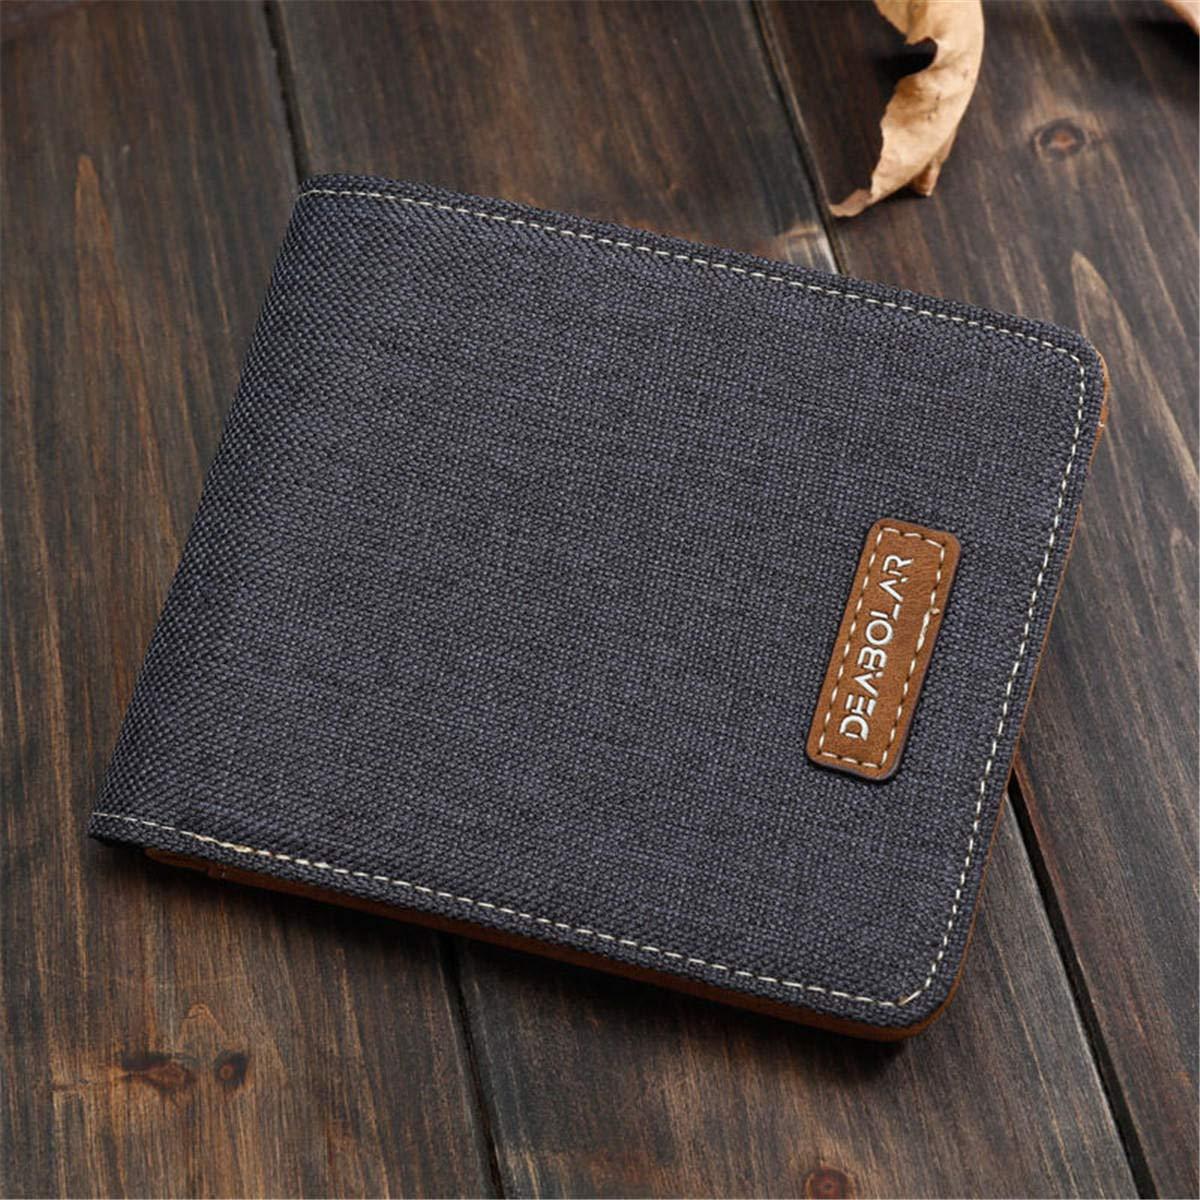 F.S.M. Men Canvas Slim Billfold Wallet Clutch Handbag Credit Card Purse Holder - Black Vertical by F.S.M.